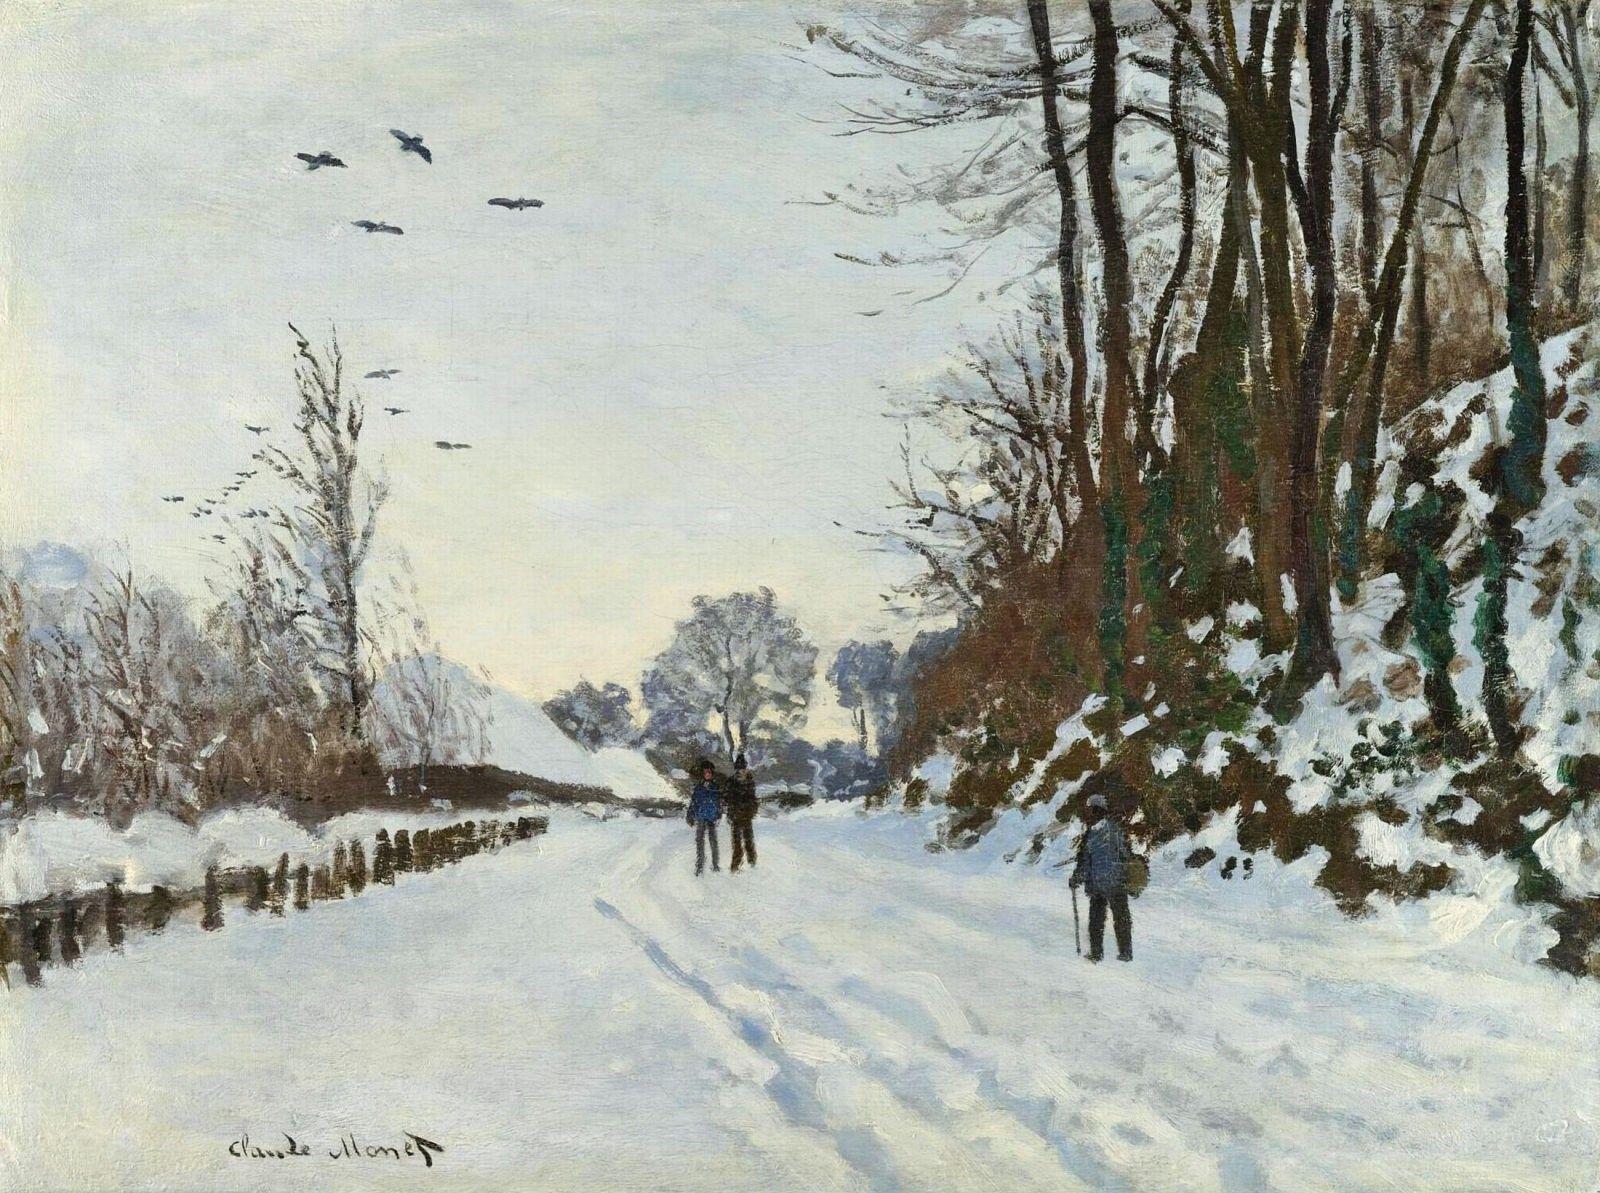 The Road to the Farm of Saint-Simeon in Winter, monet, 1867   モネ, 雪景, クロードモネ